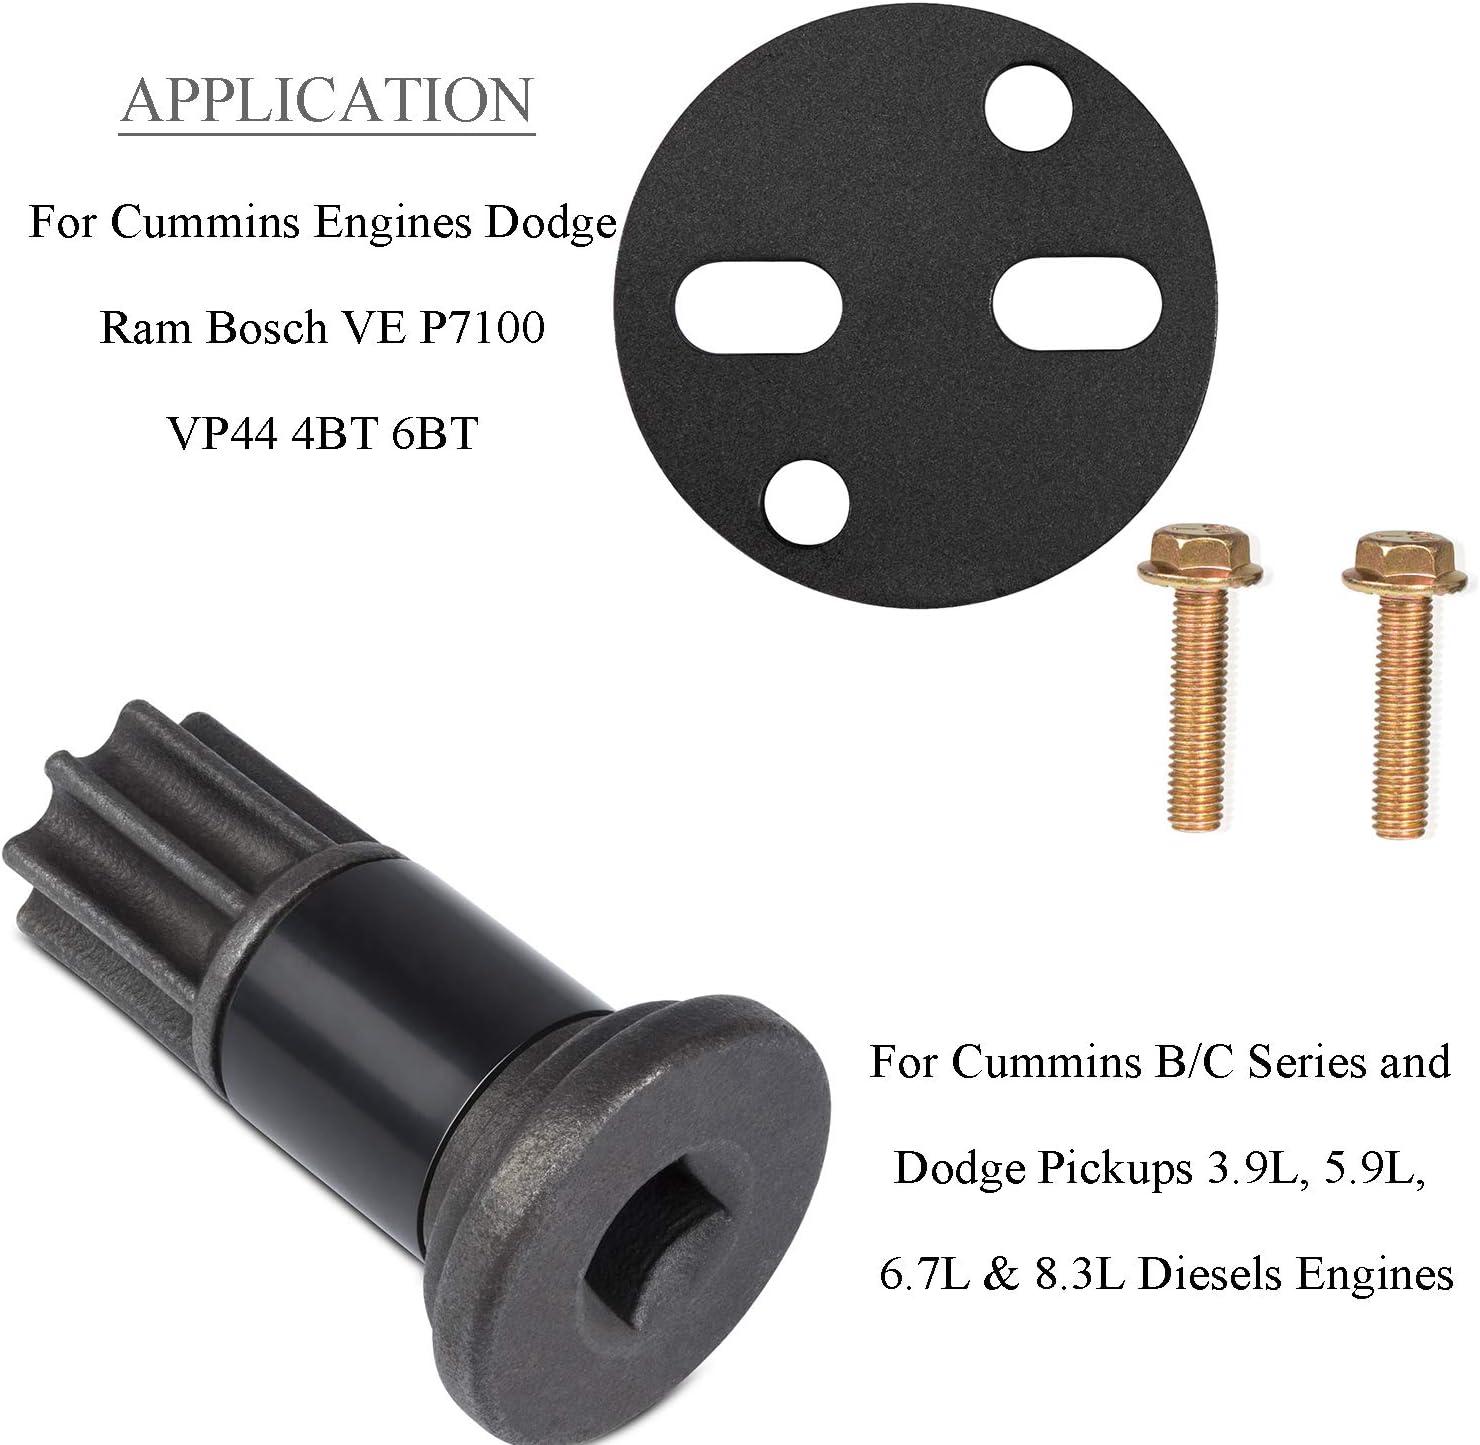 Sunluway Injection Pump Gear Puller Removal Installer Tool /& Engine Barring//Rotating Tool for Cummins Engines B//C Series,Dodge Ram Bosch VE P7100 VP44 4BT 6BT